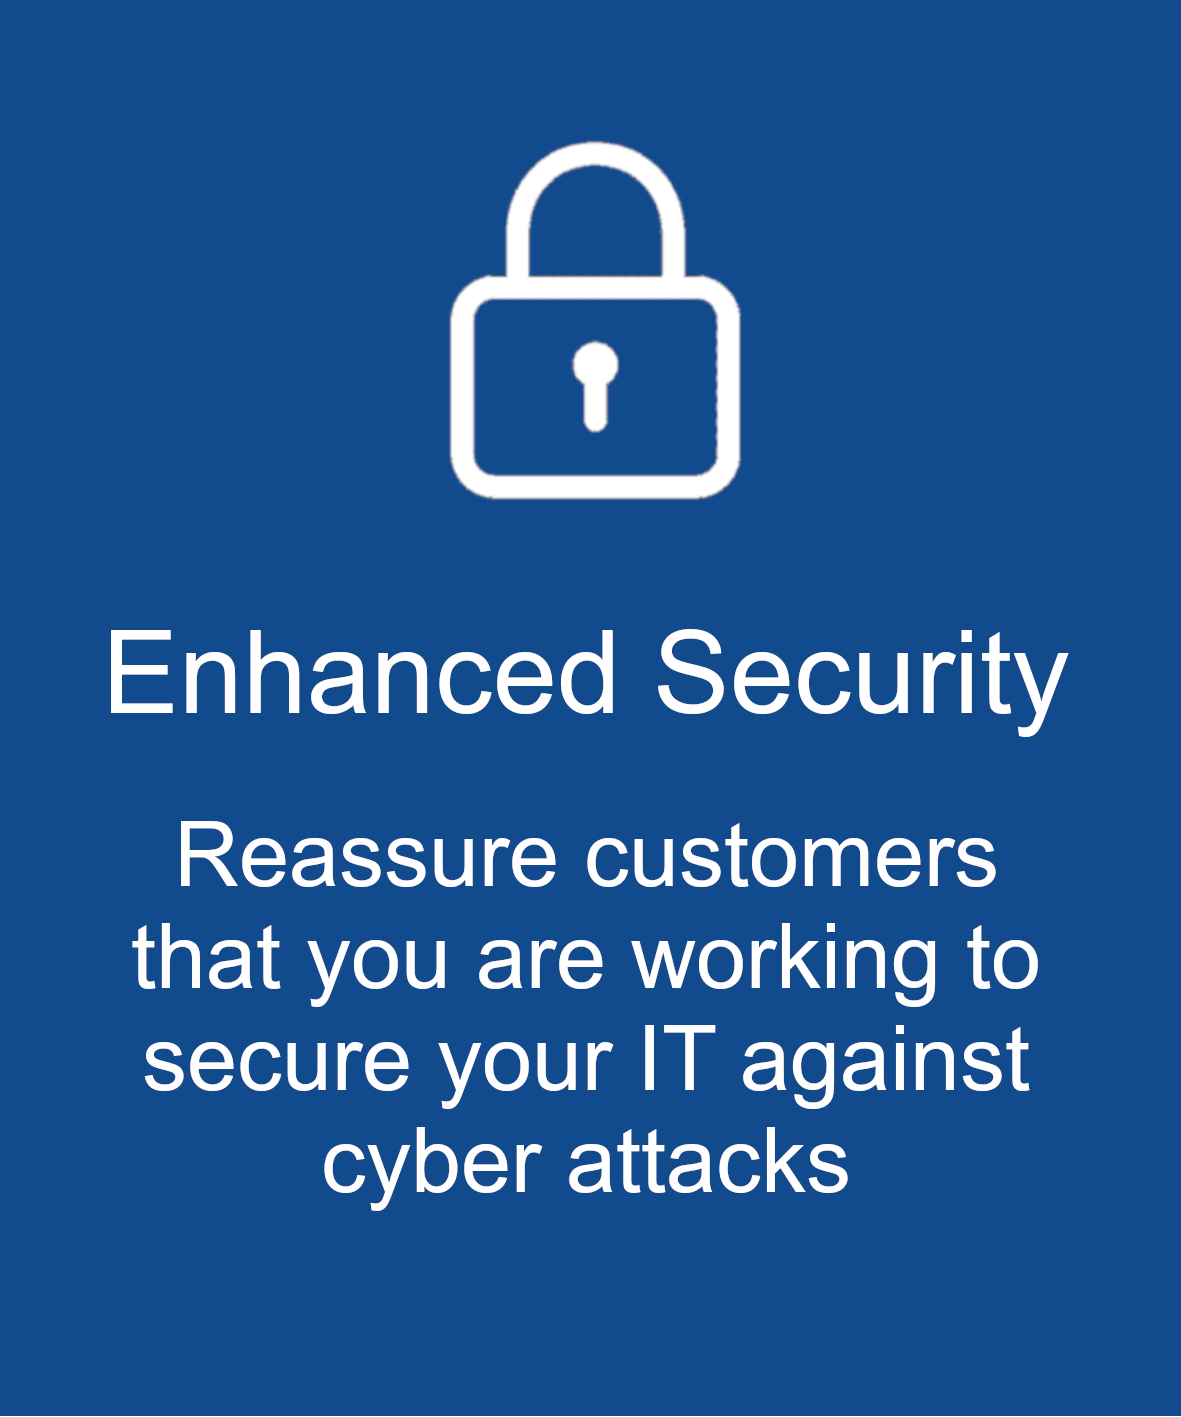 Enhanced Security